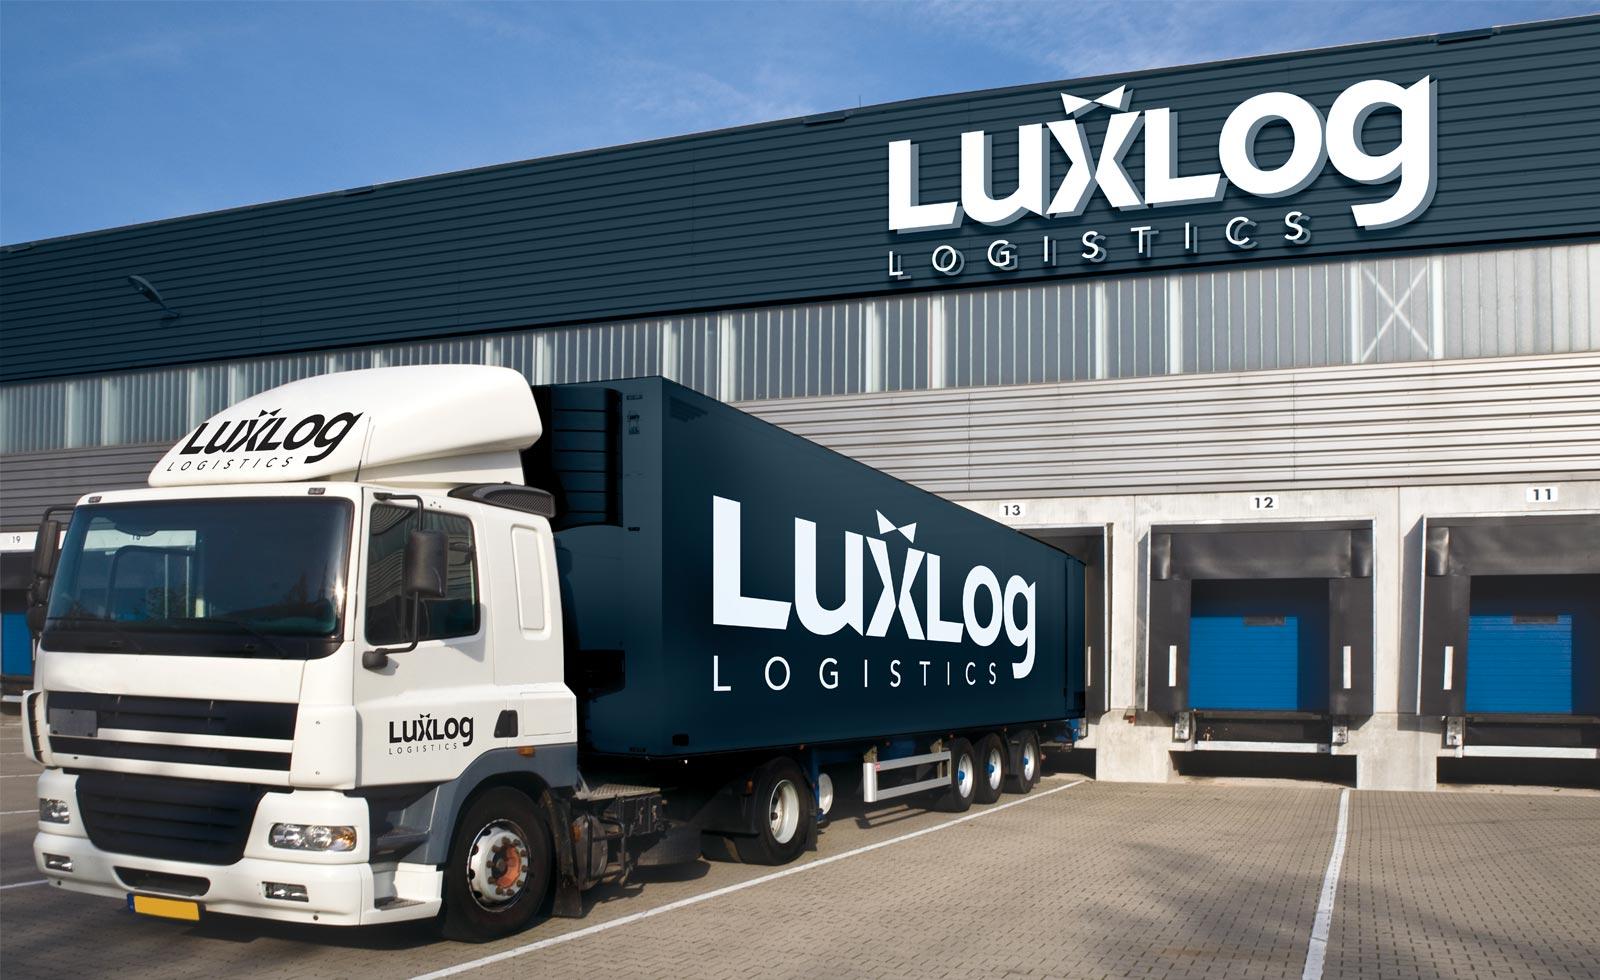 luxlog logistics fashion corporate identity brand